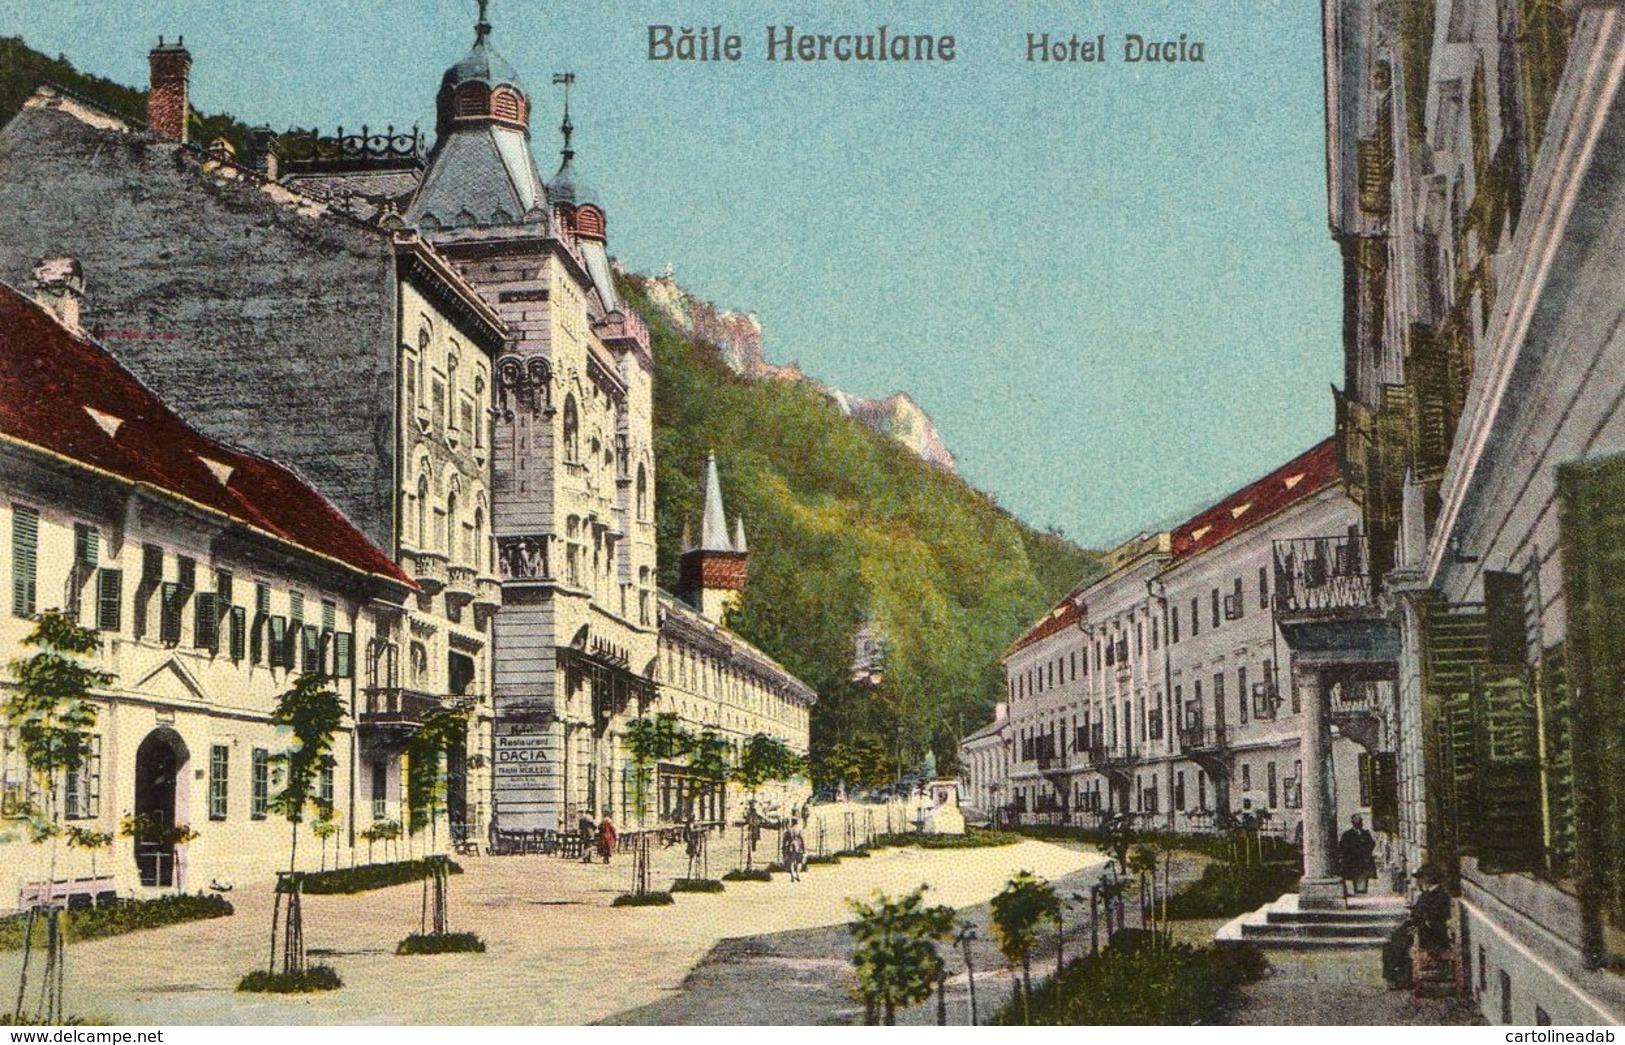 [DC7713] CPA - ROMANIA - BAILE HERCULANE - HOTEL DACIA - Non Viaggiata - Old Postcard - Romania